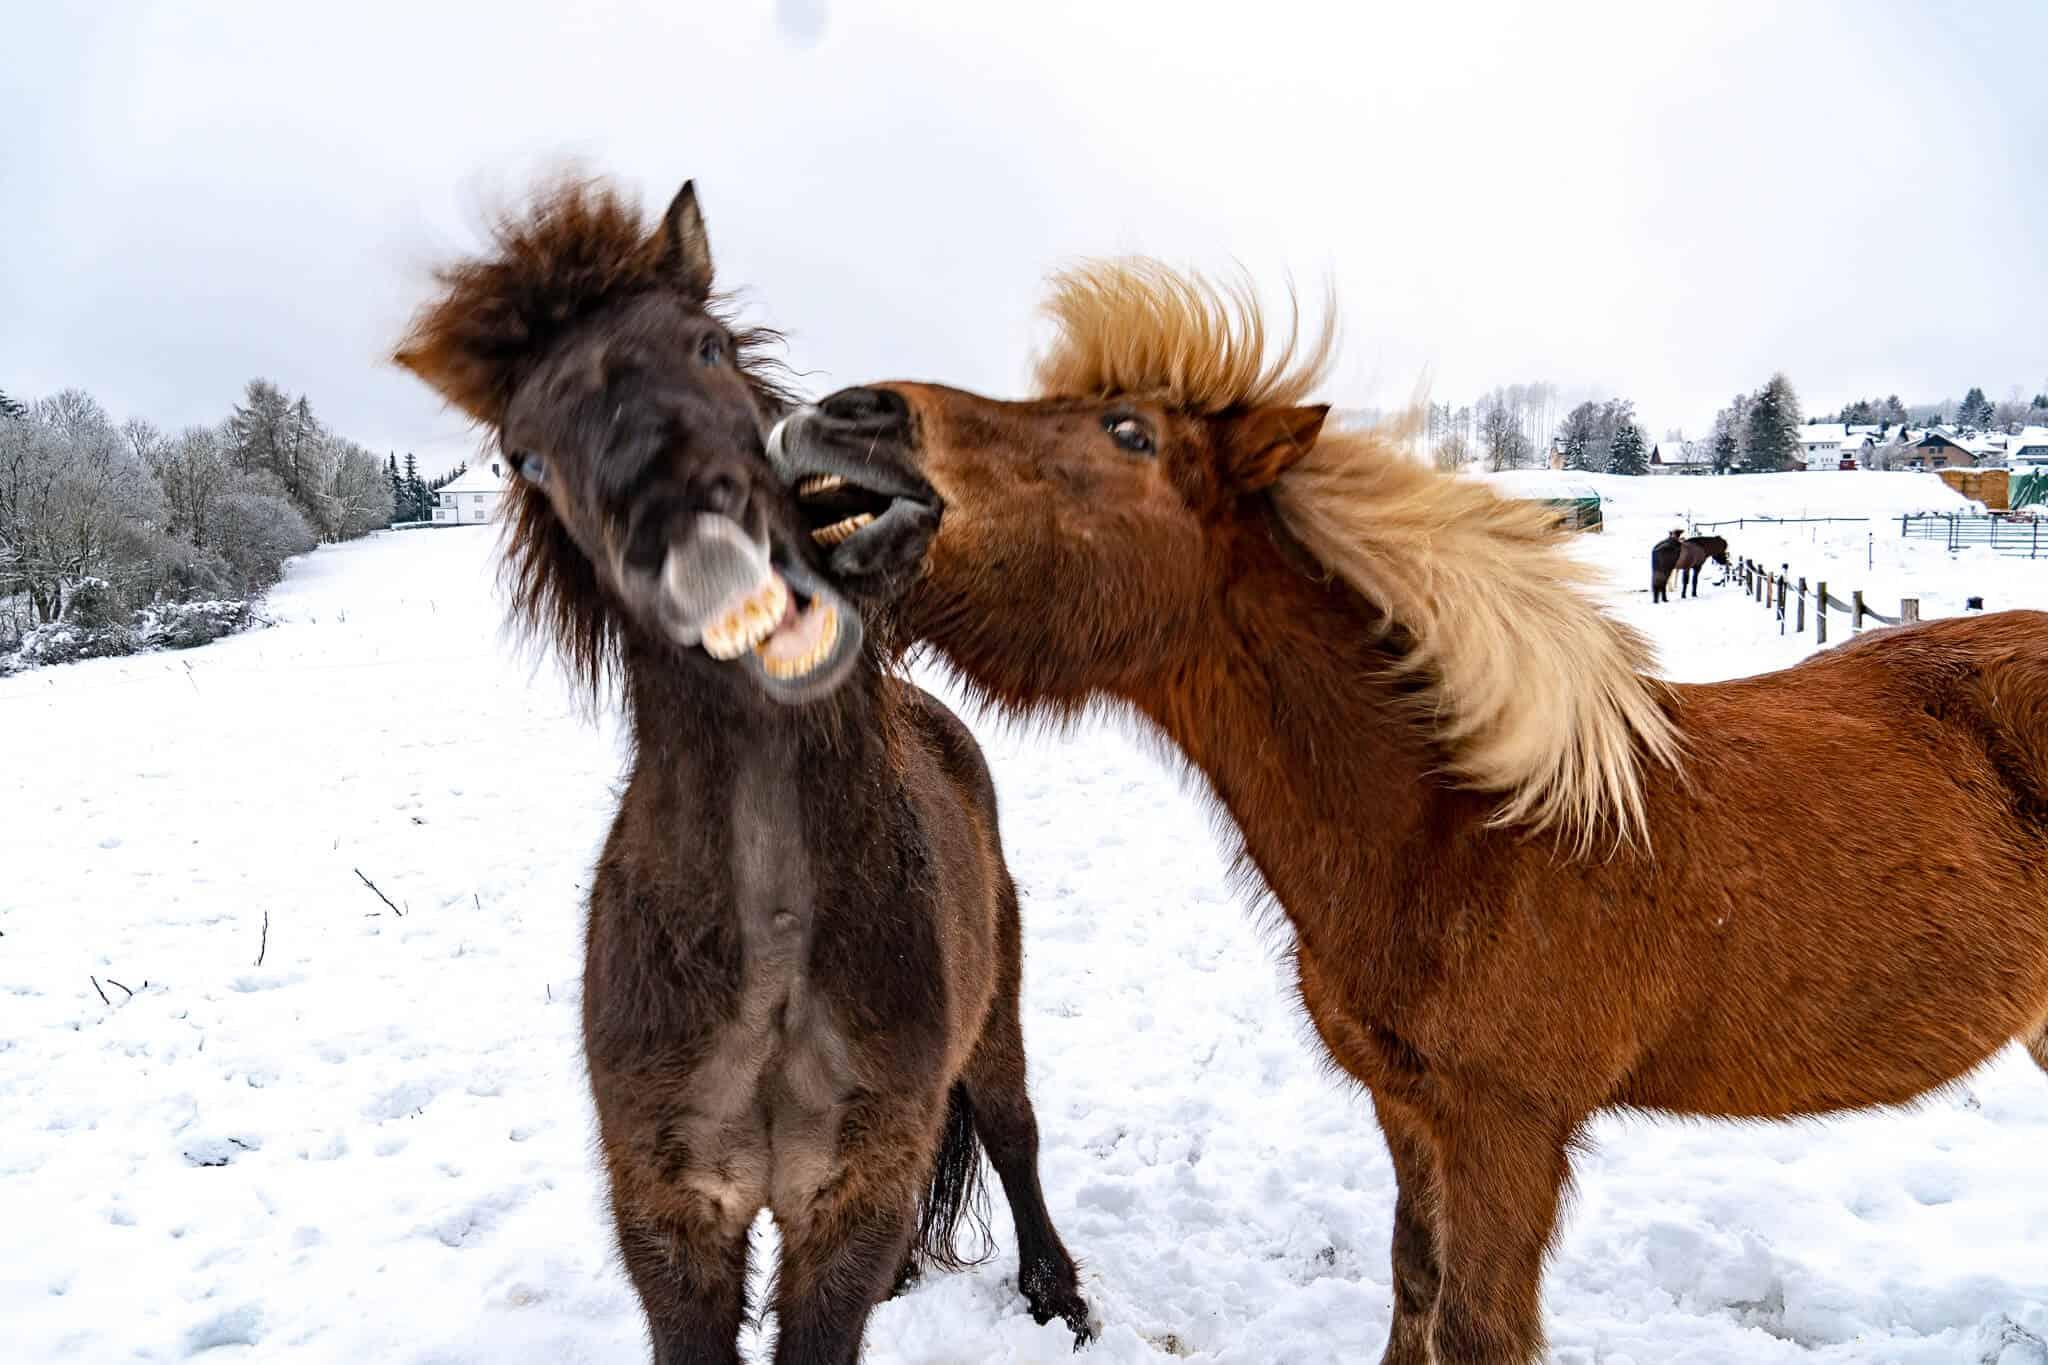 Islandpferde zanken